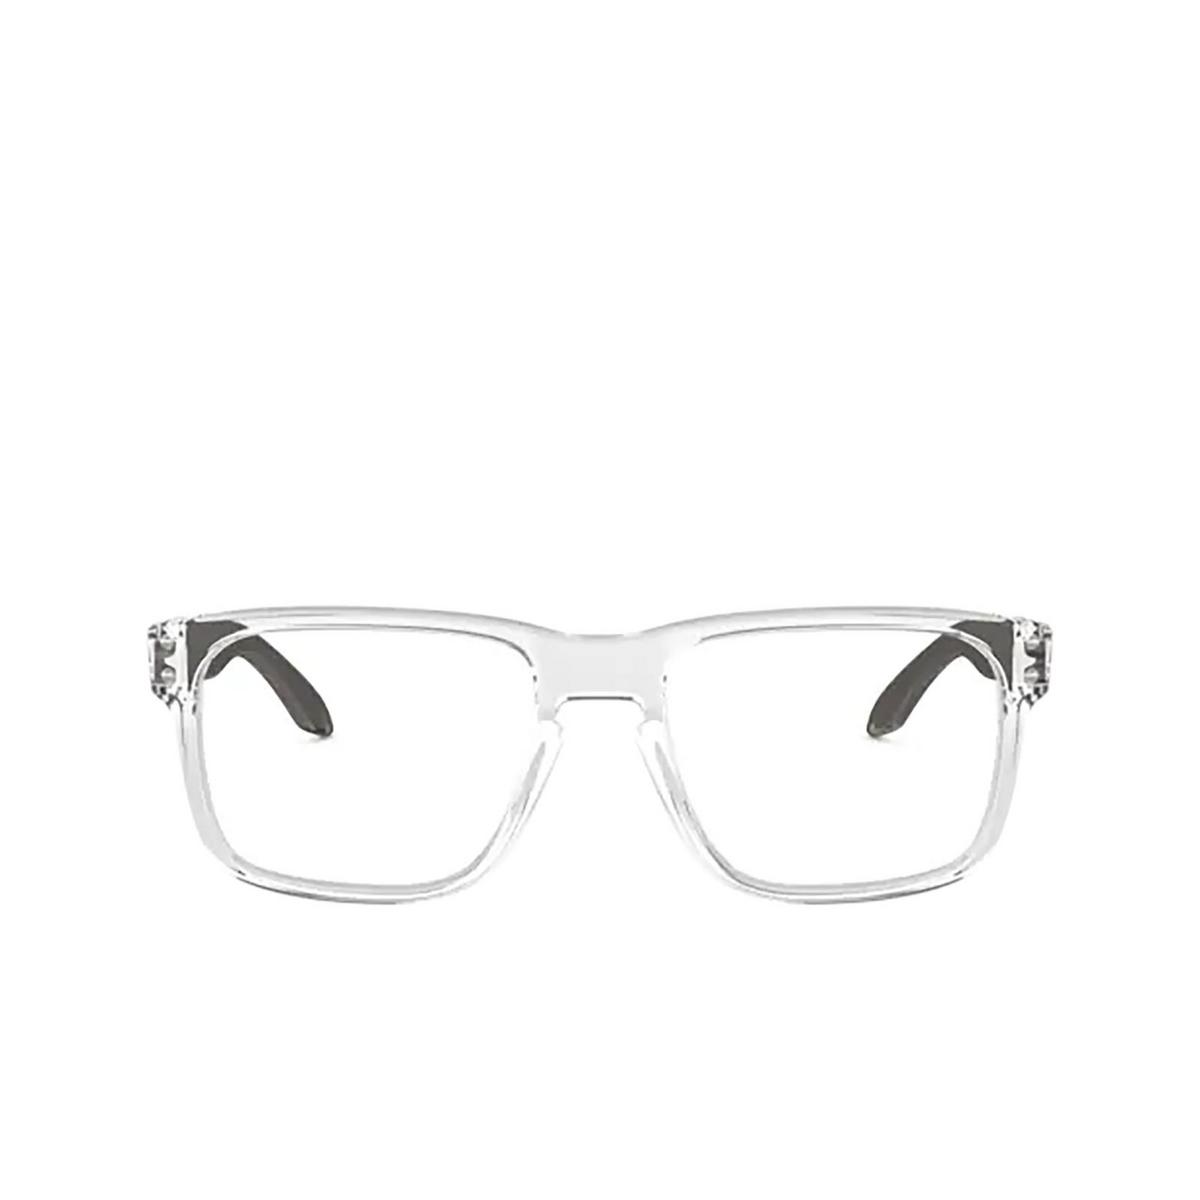 Oakley® Square Eyeglasses: Holbrook Rx OX8156 color Polished Clear 815603.